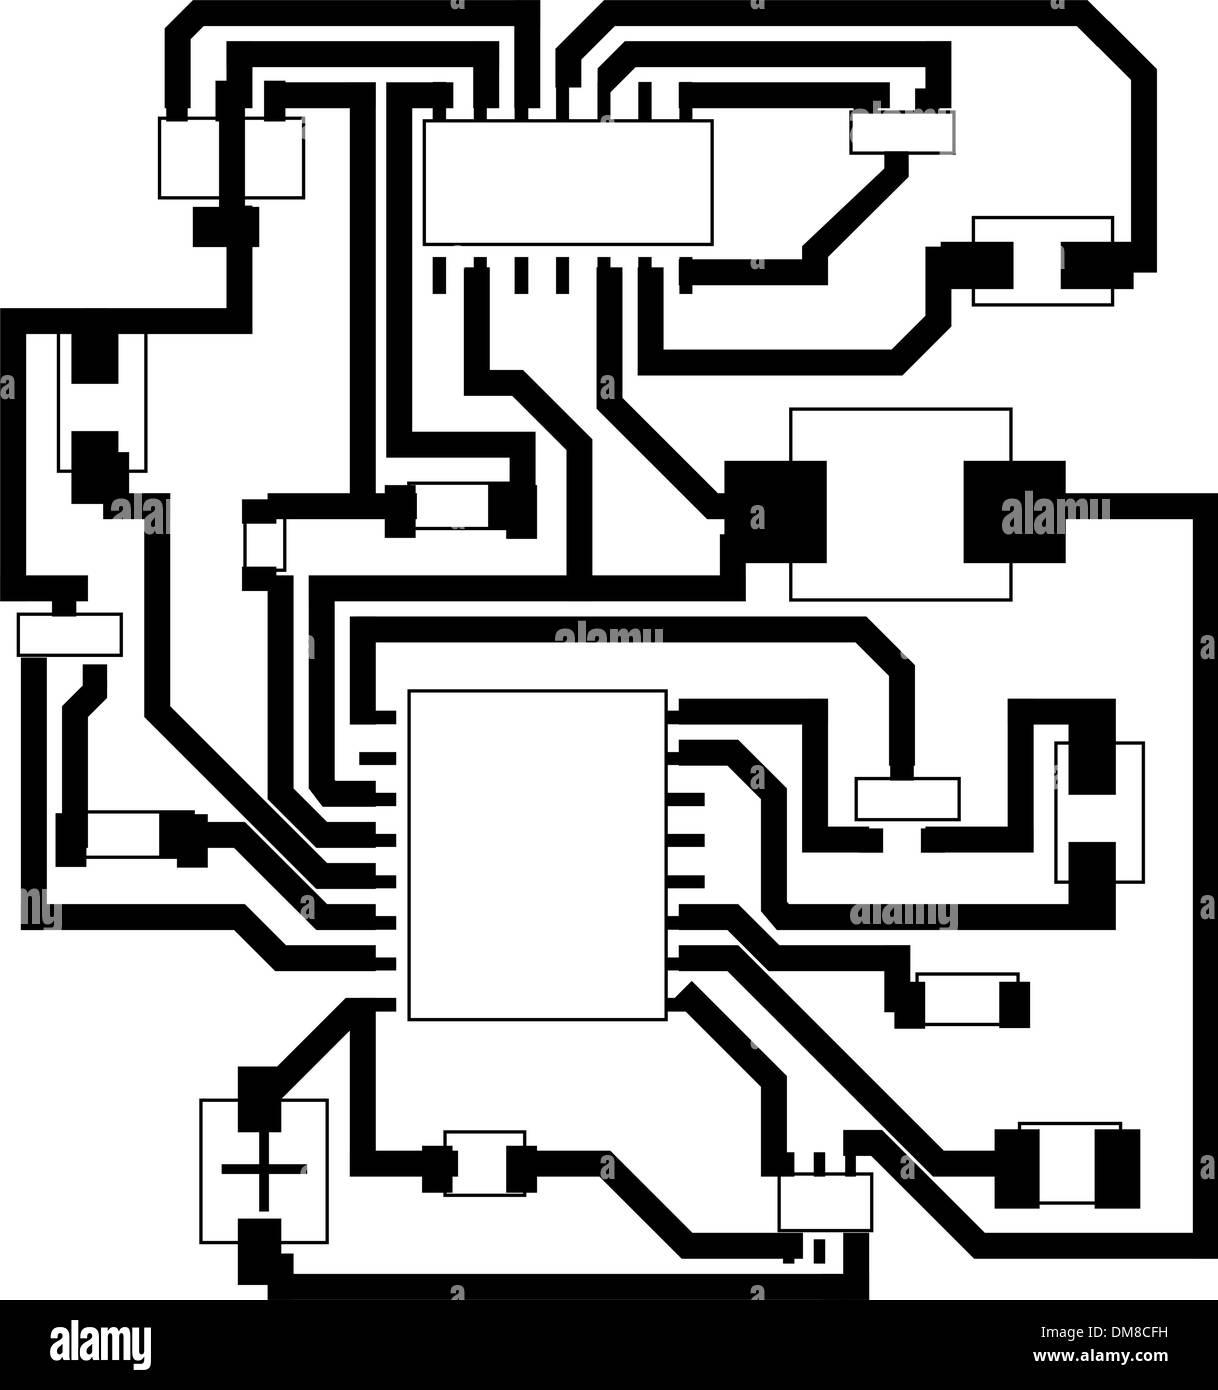 electrical scheme Stock Vector Art & Illustration, Vector Image ...